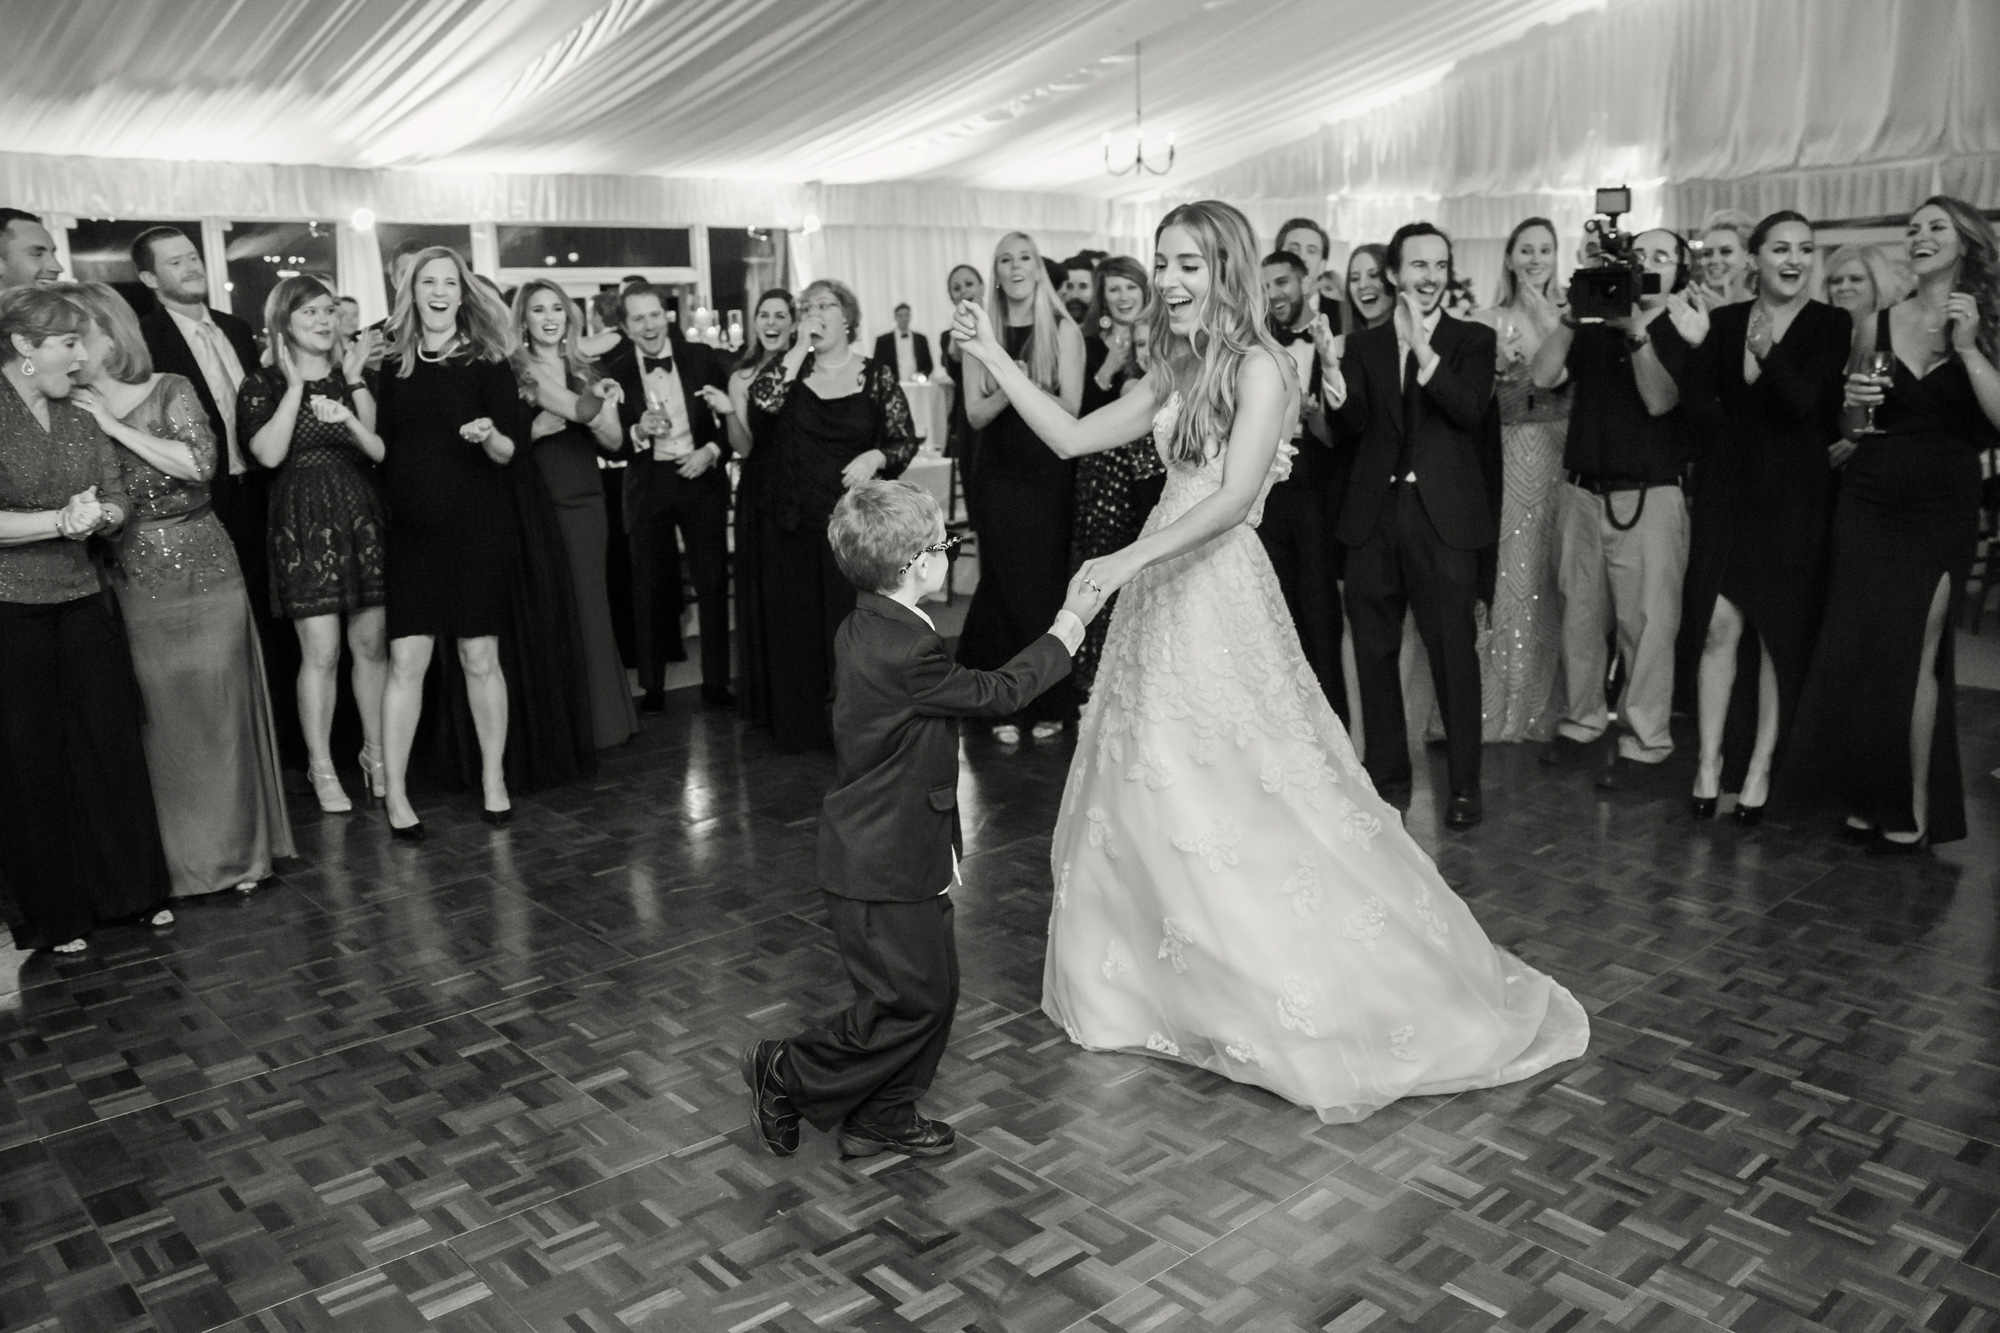 68_Christina_Daniel_Hamilton_Farm_Golf_Club_Wedding_NJ_Tanya_Salazar_Photography_1018.jpg